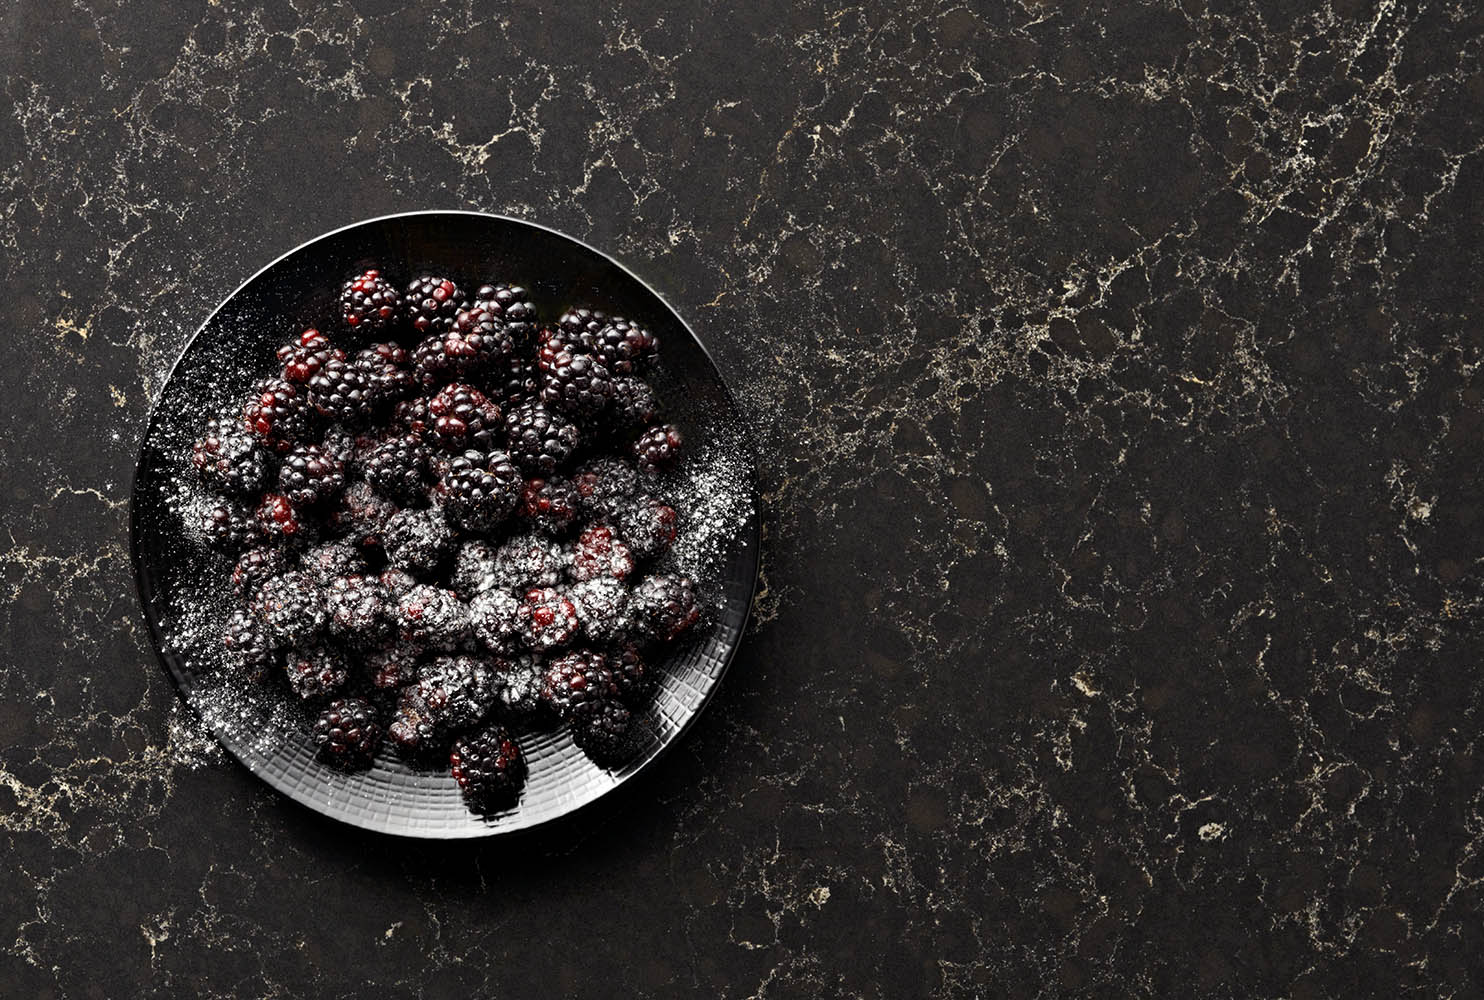 caesarstone•blackberries